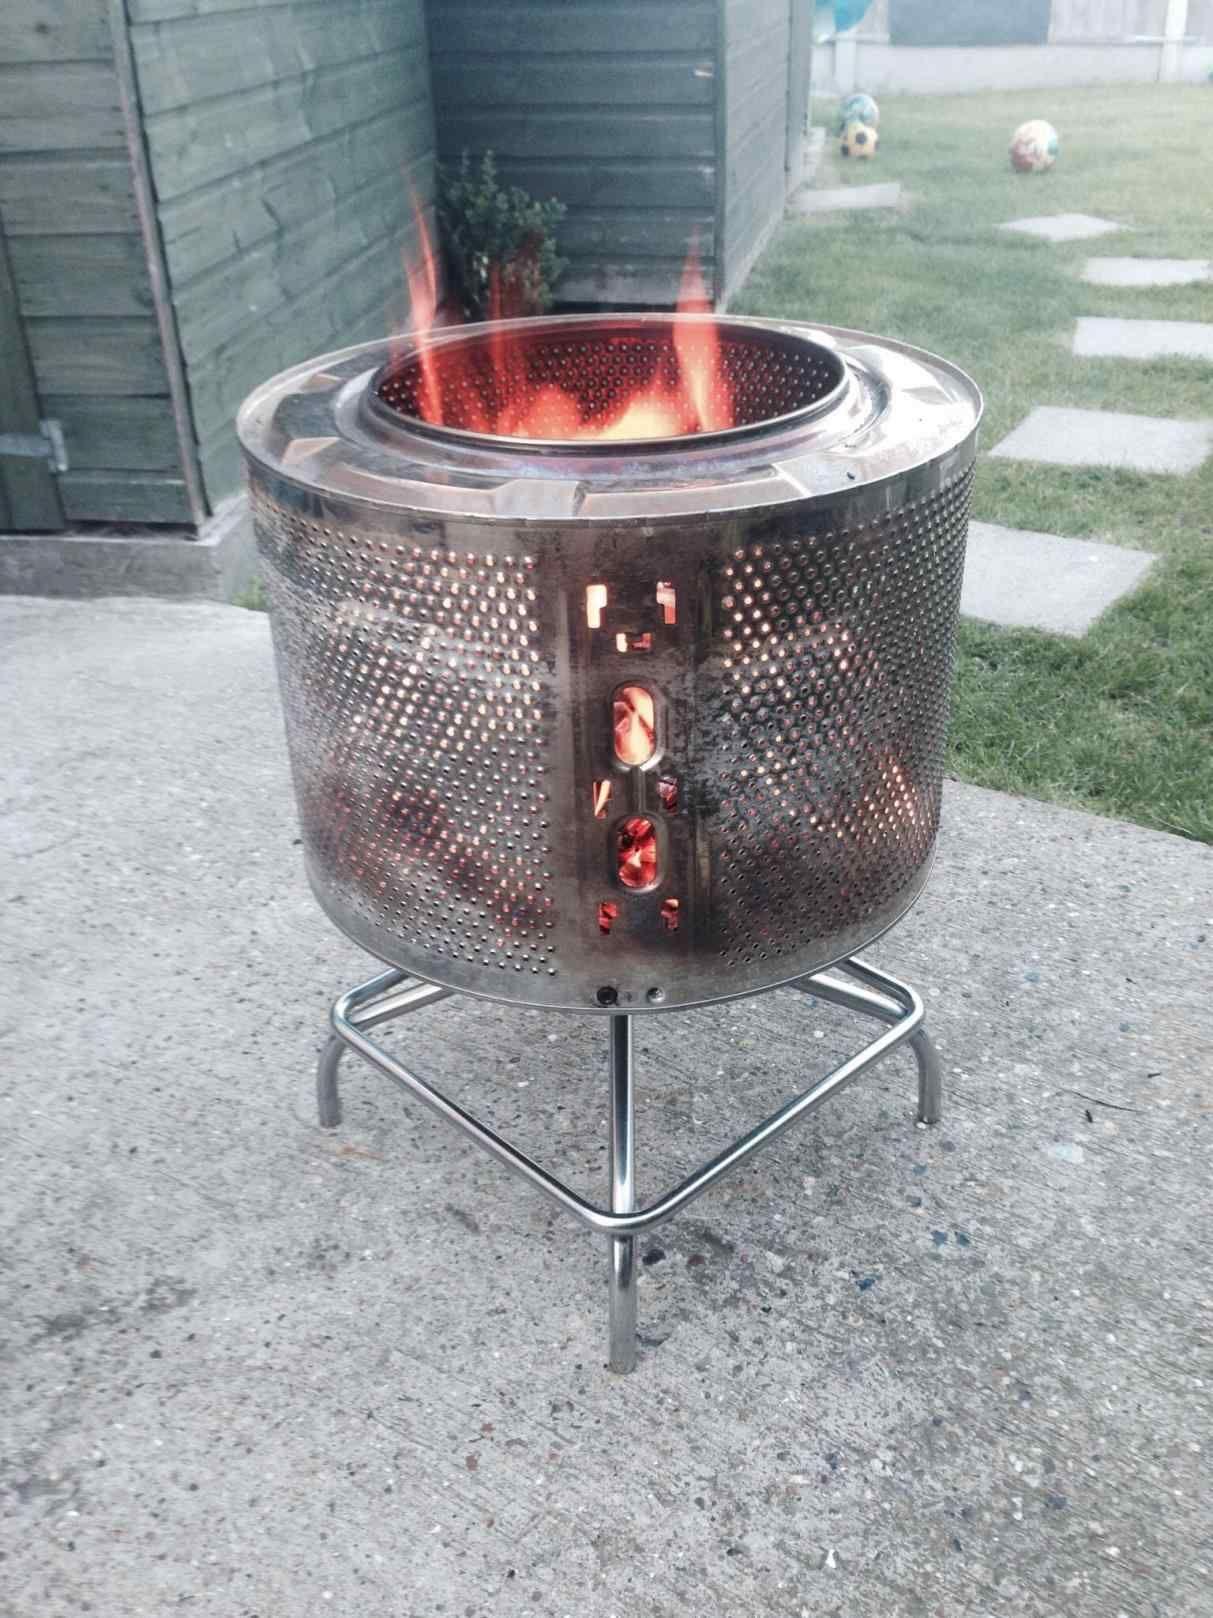 Photo of new Diy Metal Fire Pit fire pit washing machine drum and stainless steel stool base rhpinterestcom perfect diy metal decorative ideasrhtarasimpsonphotocom jpg